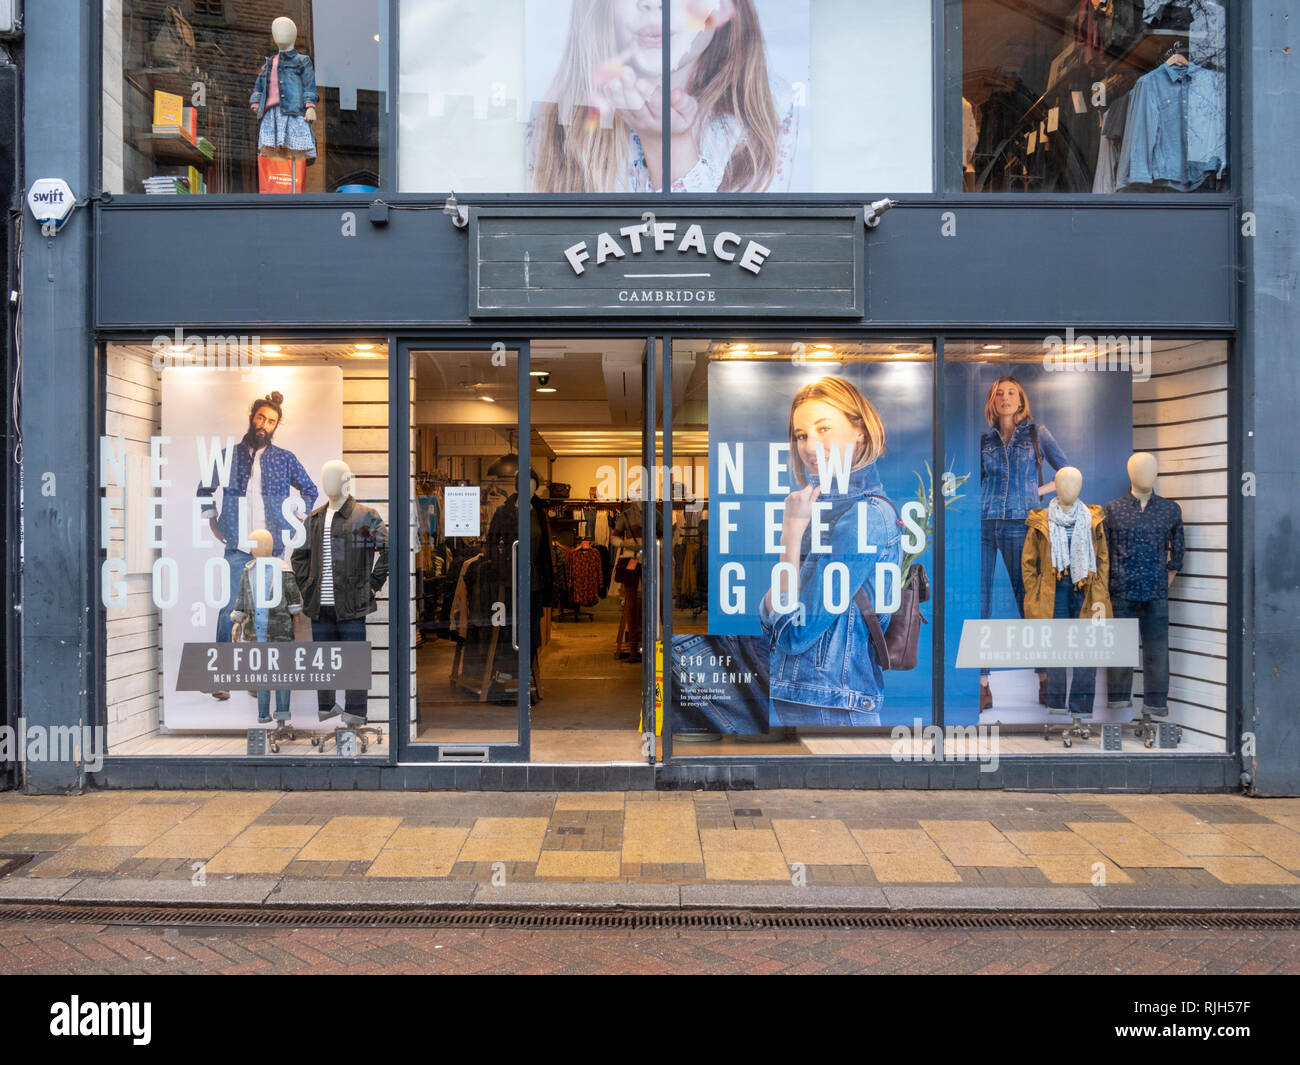 The Fat Face Clothes shop in Cambridge City Centre UK - Stock Image